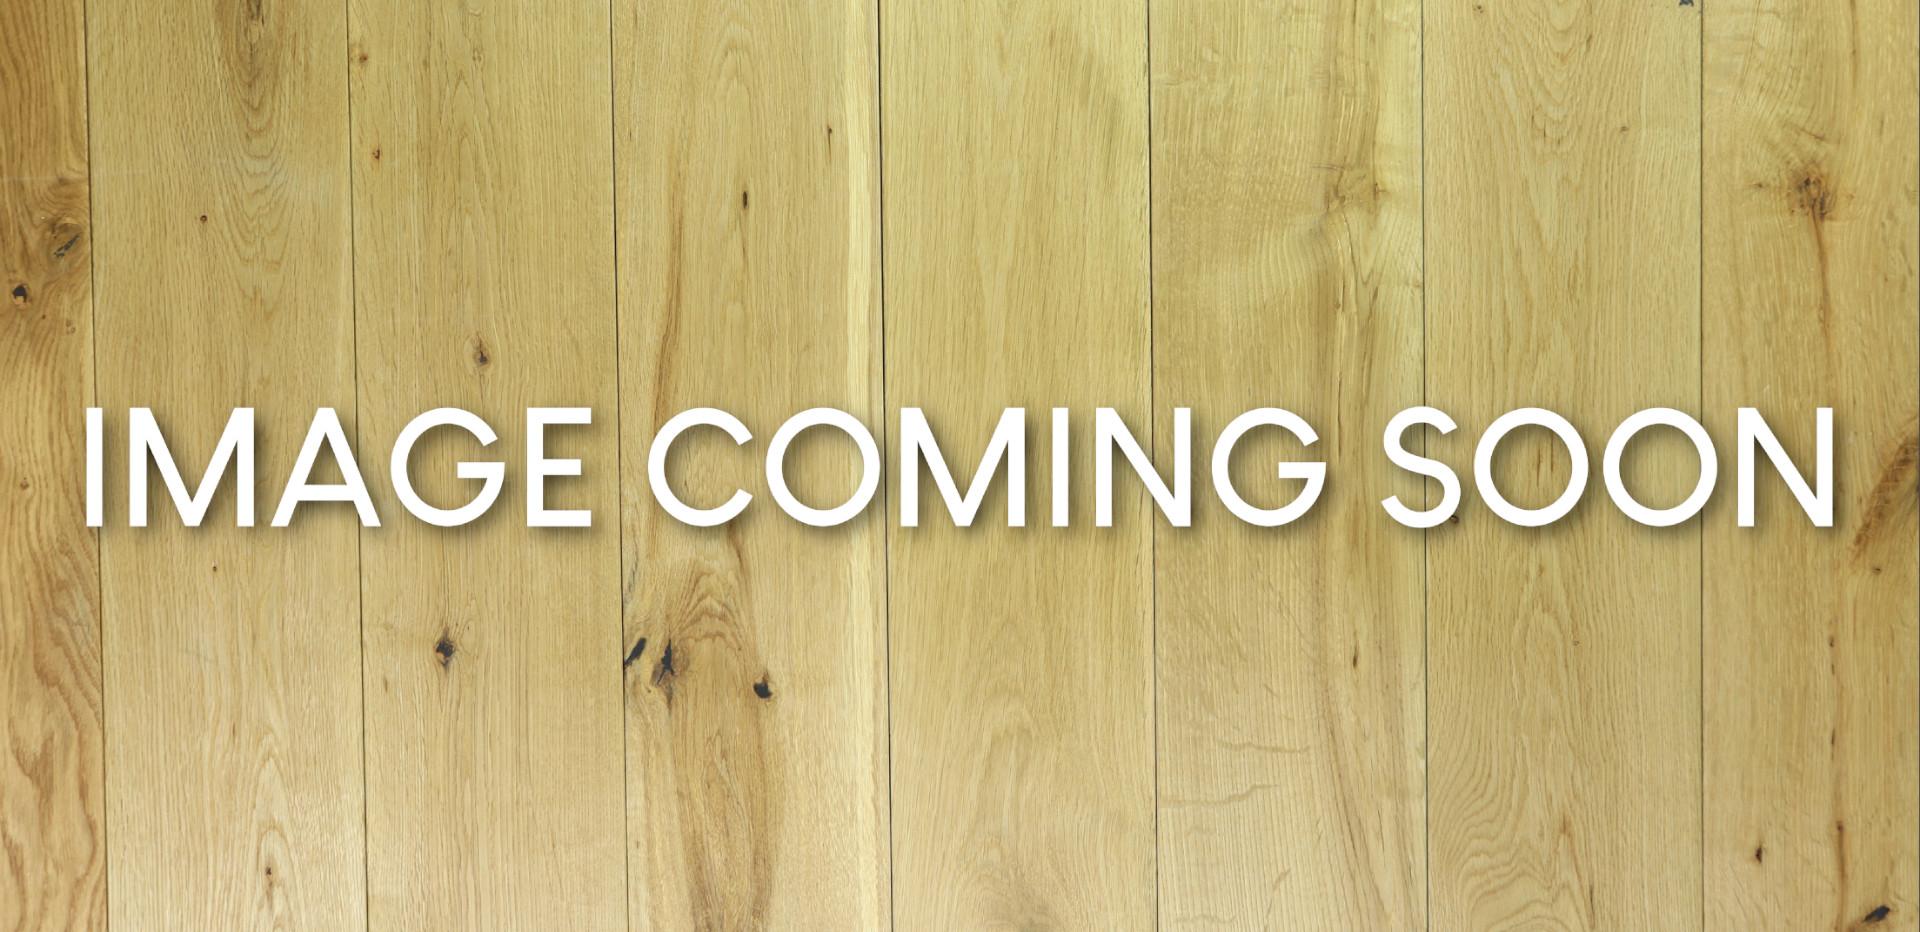 Seymour Duncan STHR1 Hot Rails Rhythm SIngle Coil Sized Humbucker Position Neck